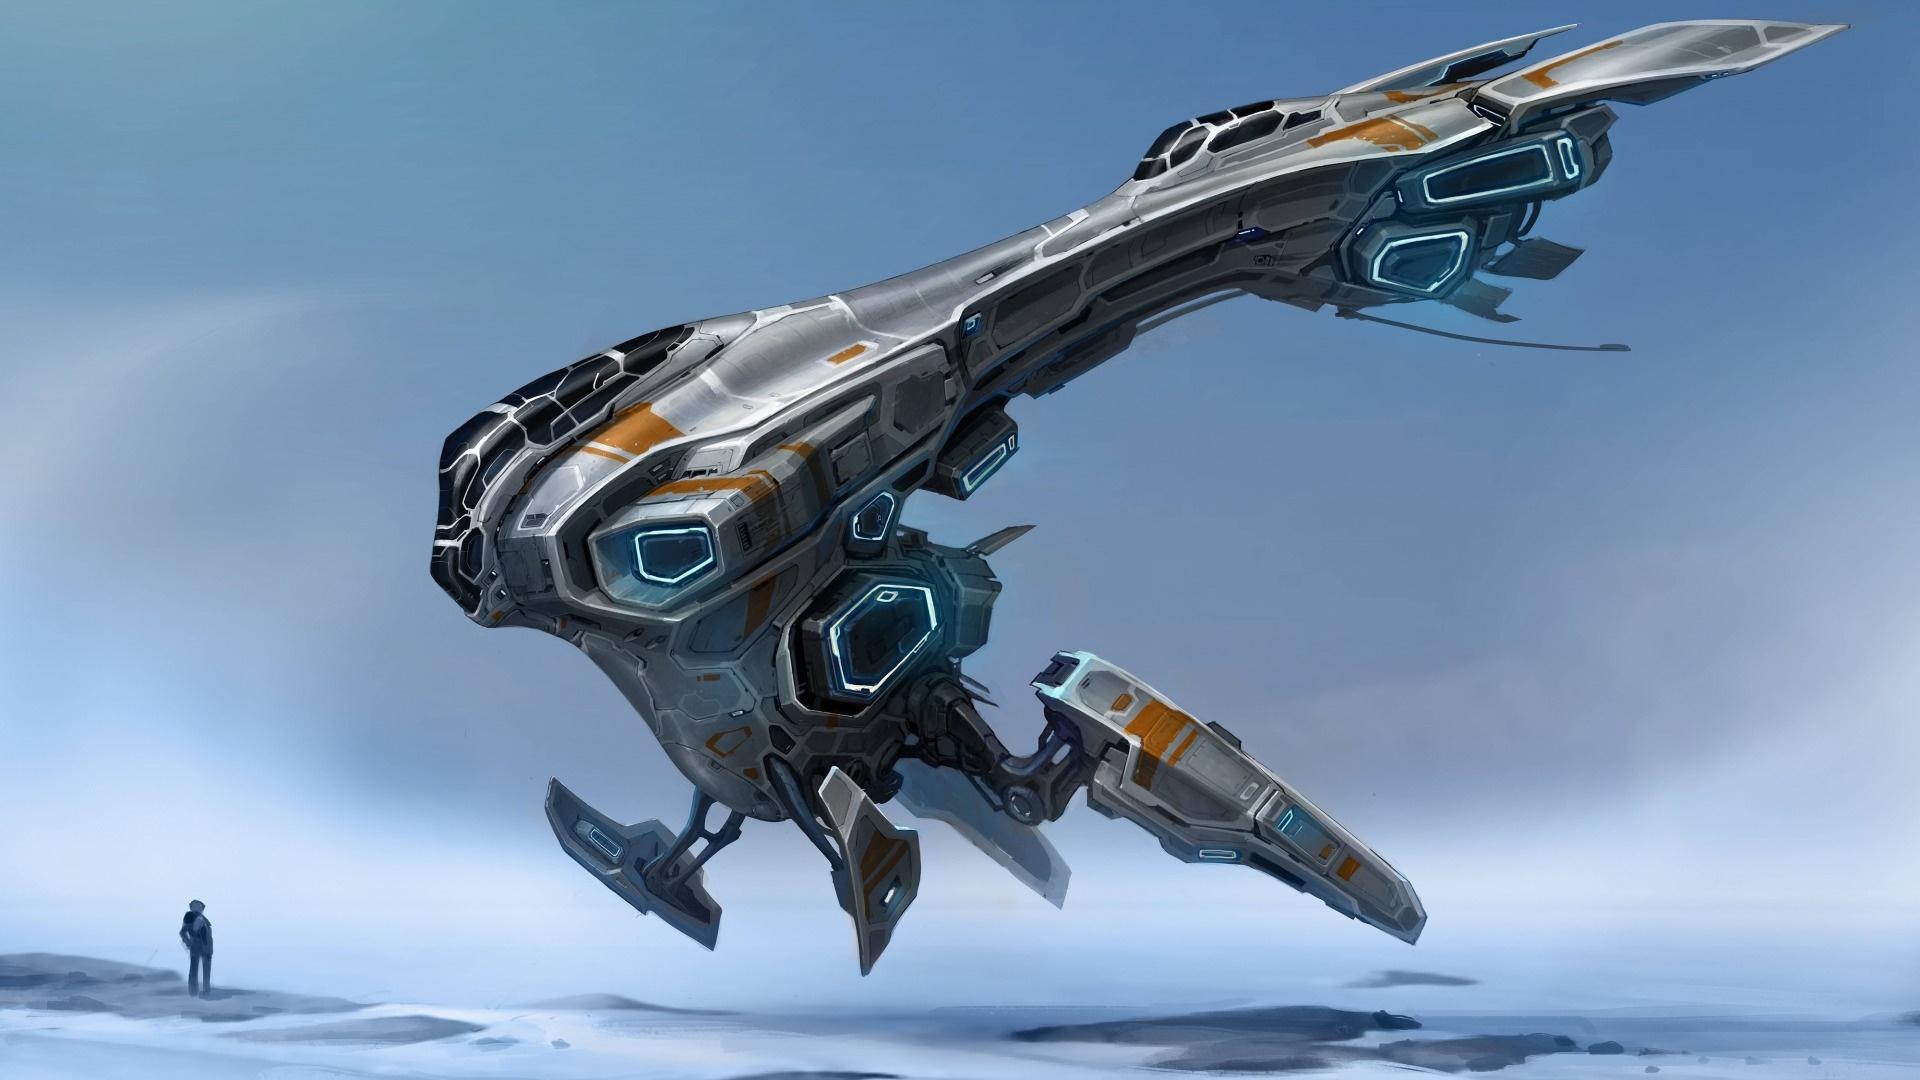 Spaceships Art desktop wallpaper hd